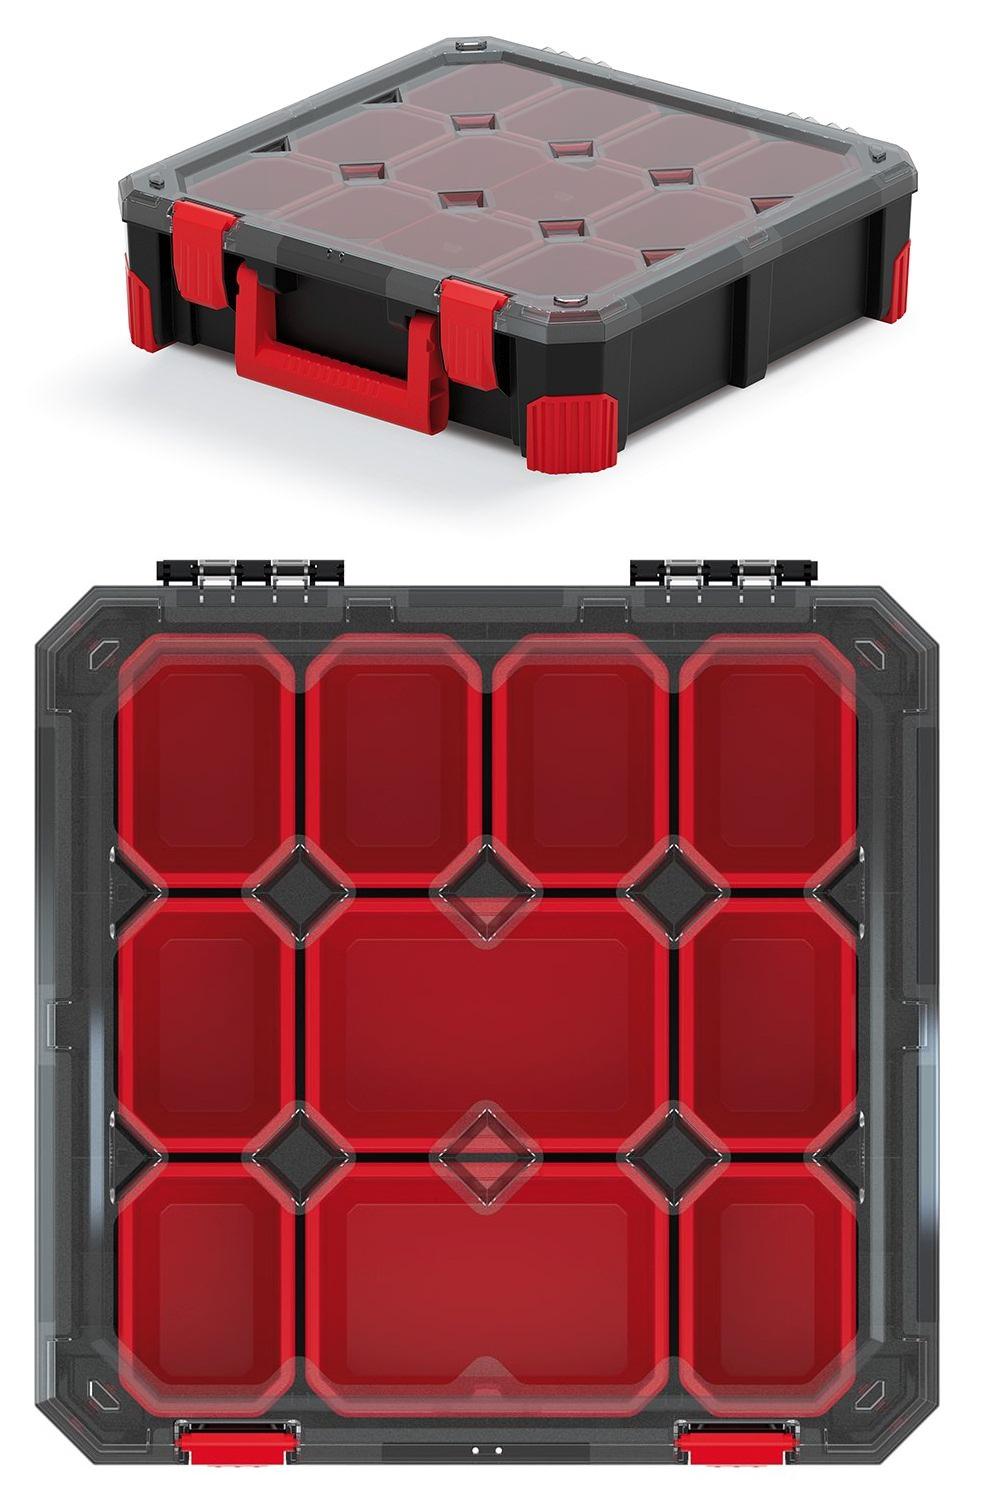 PROSPERPLAST Organizér TITAN - 10 přihrádek, průhledné víko 390x390x110